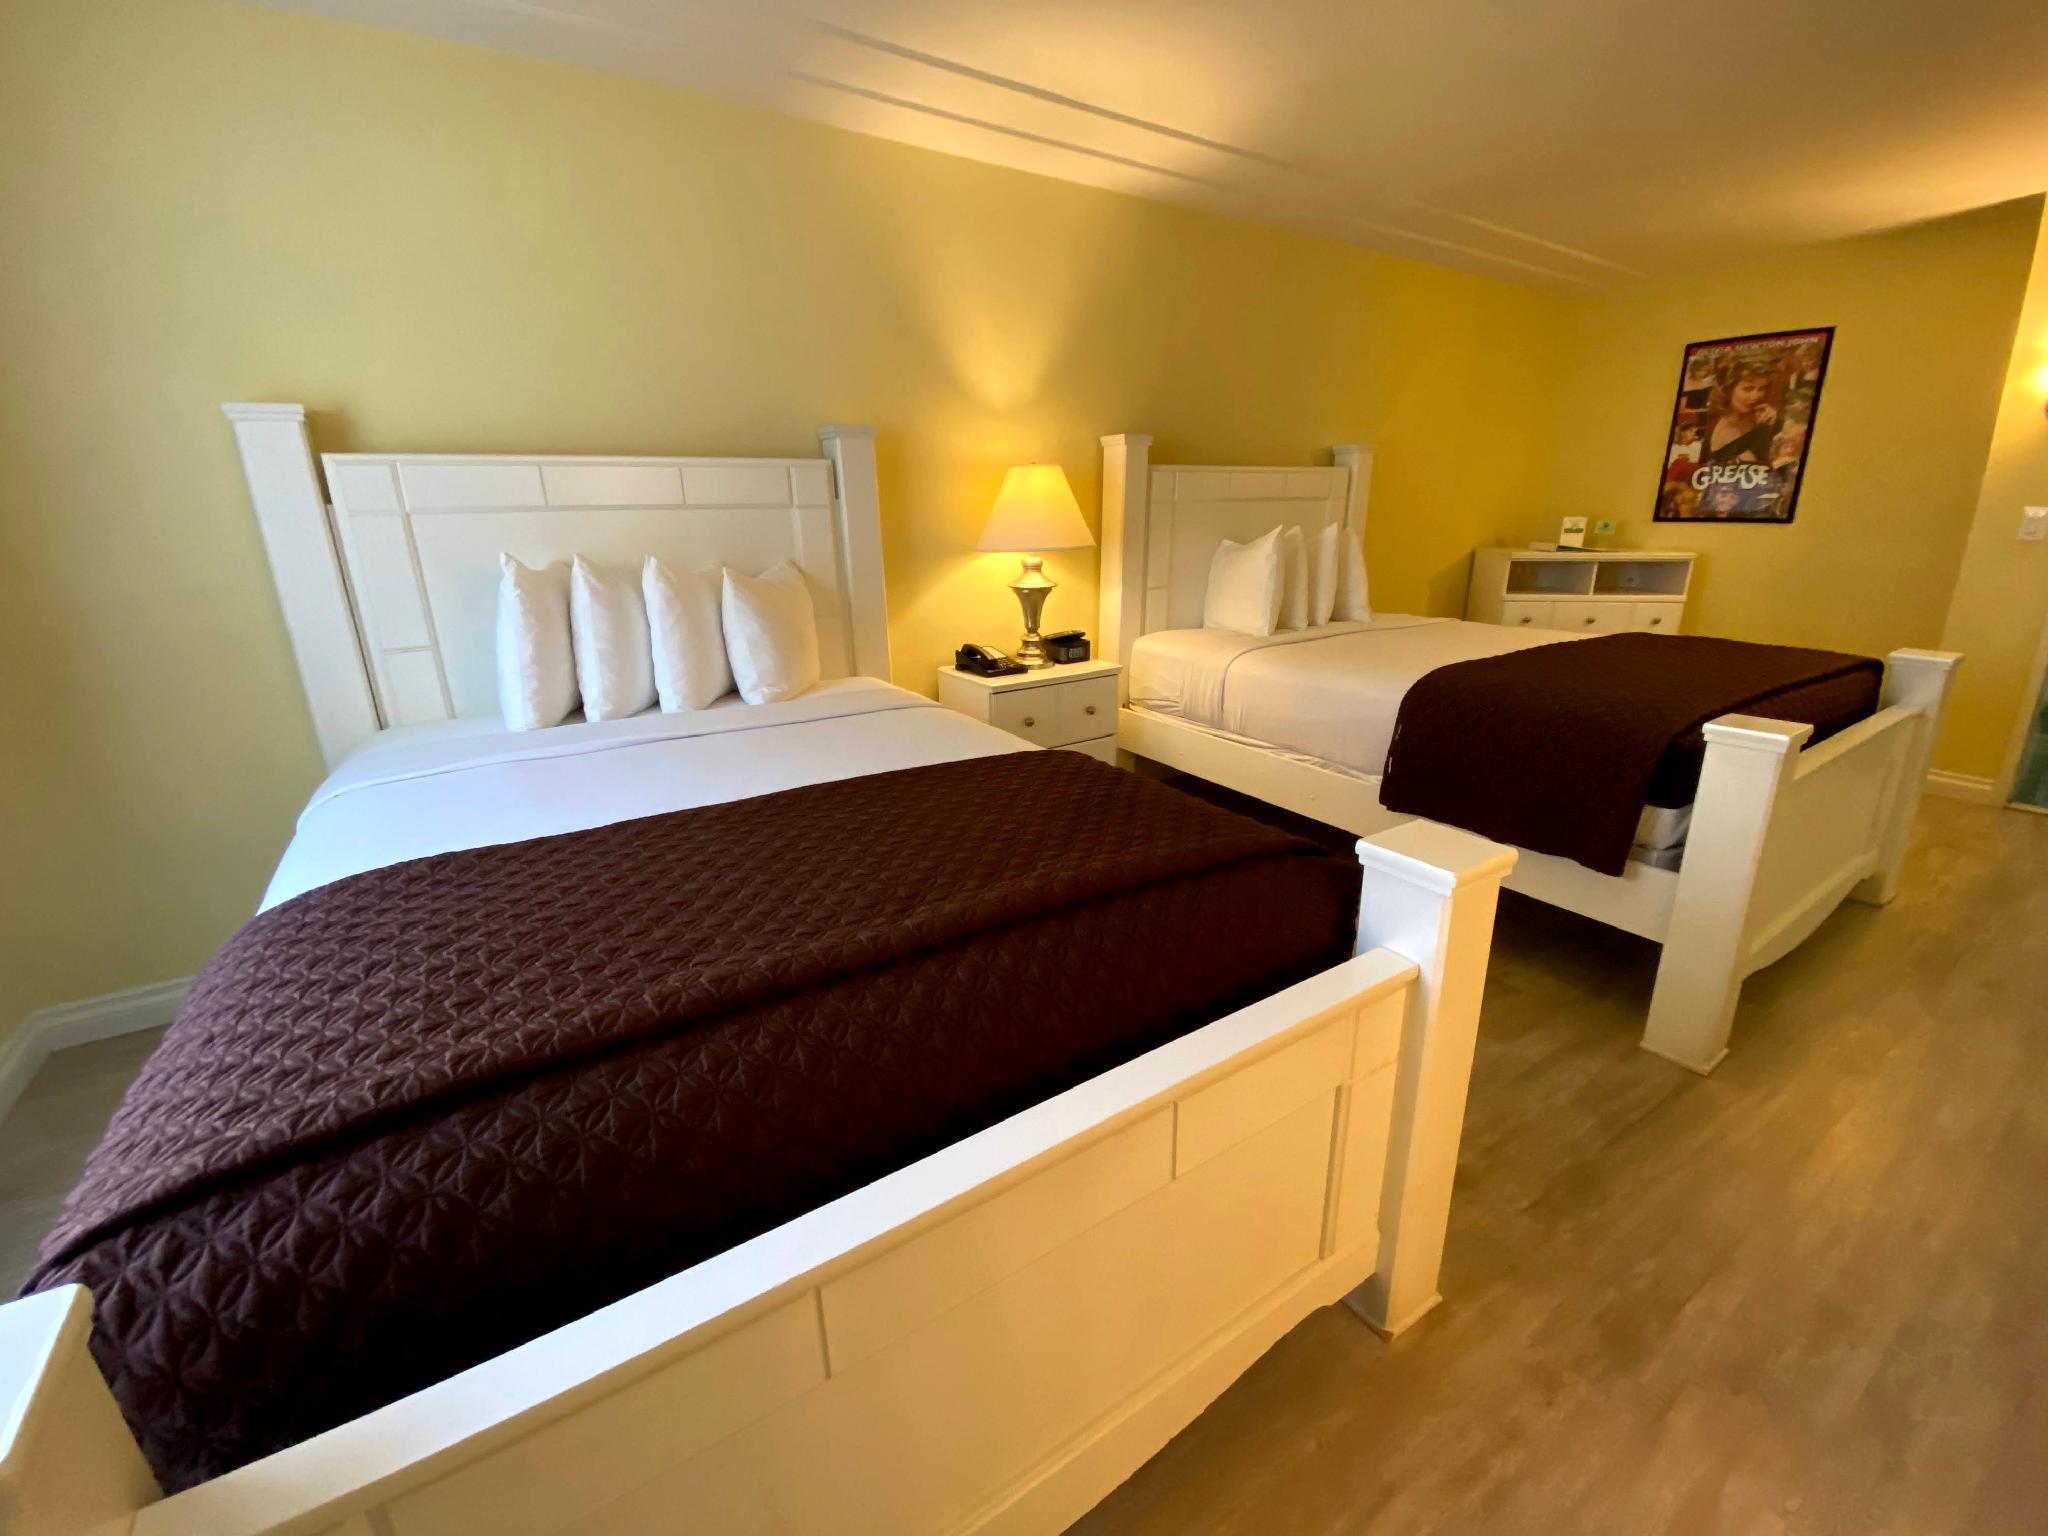 Executive Queen Room with 2 Queen Beds